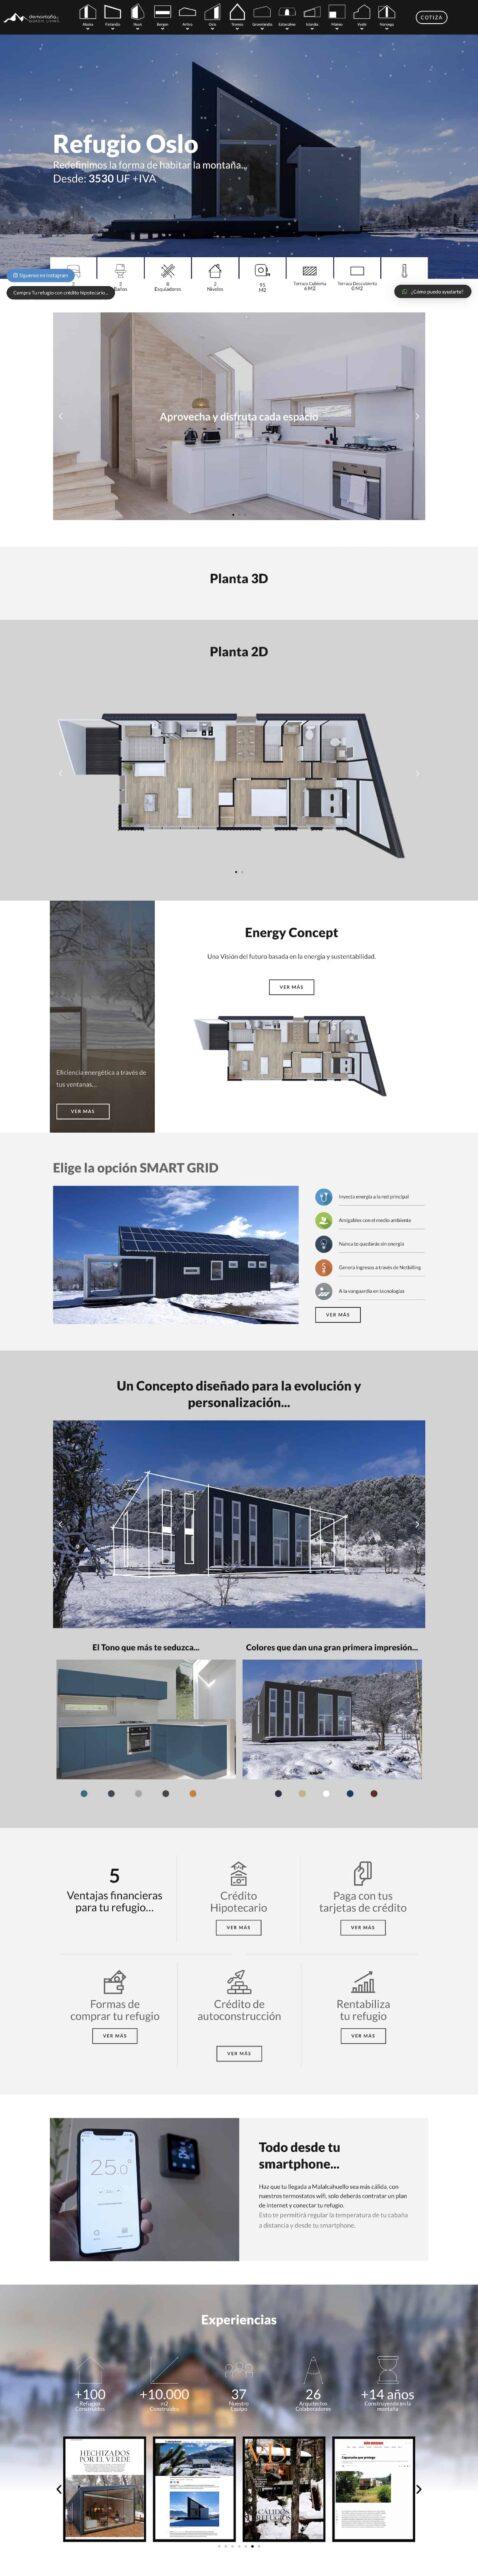 sondys online marketing web design web development houston demontana cl_refugios de montana_oslo